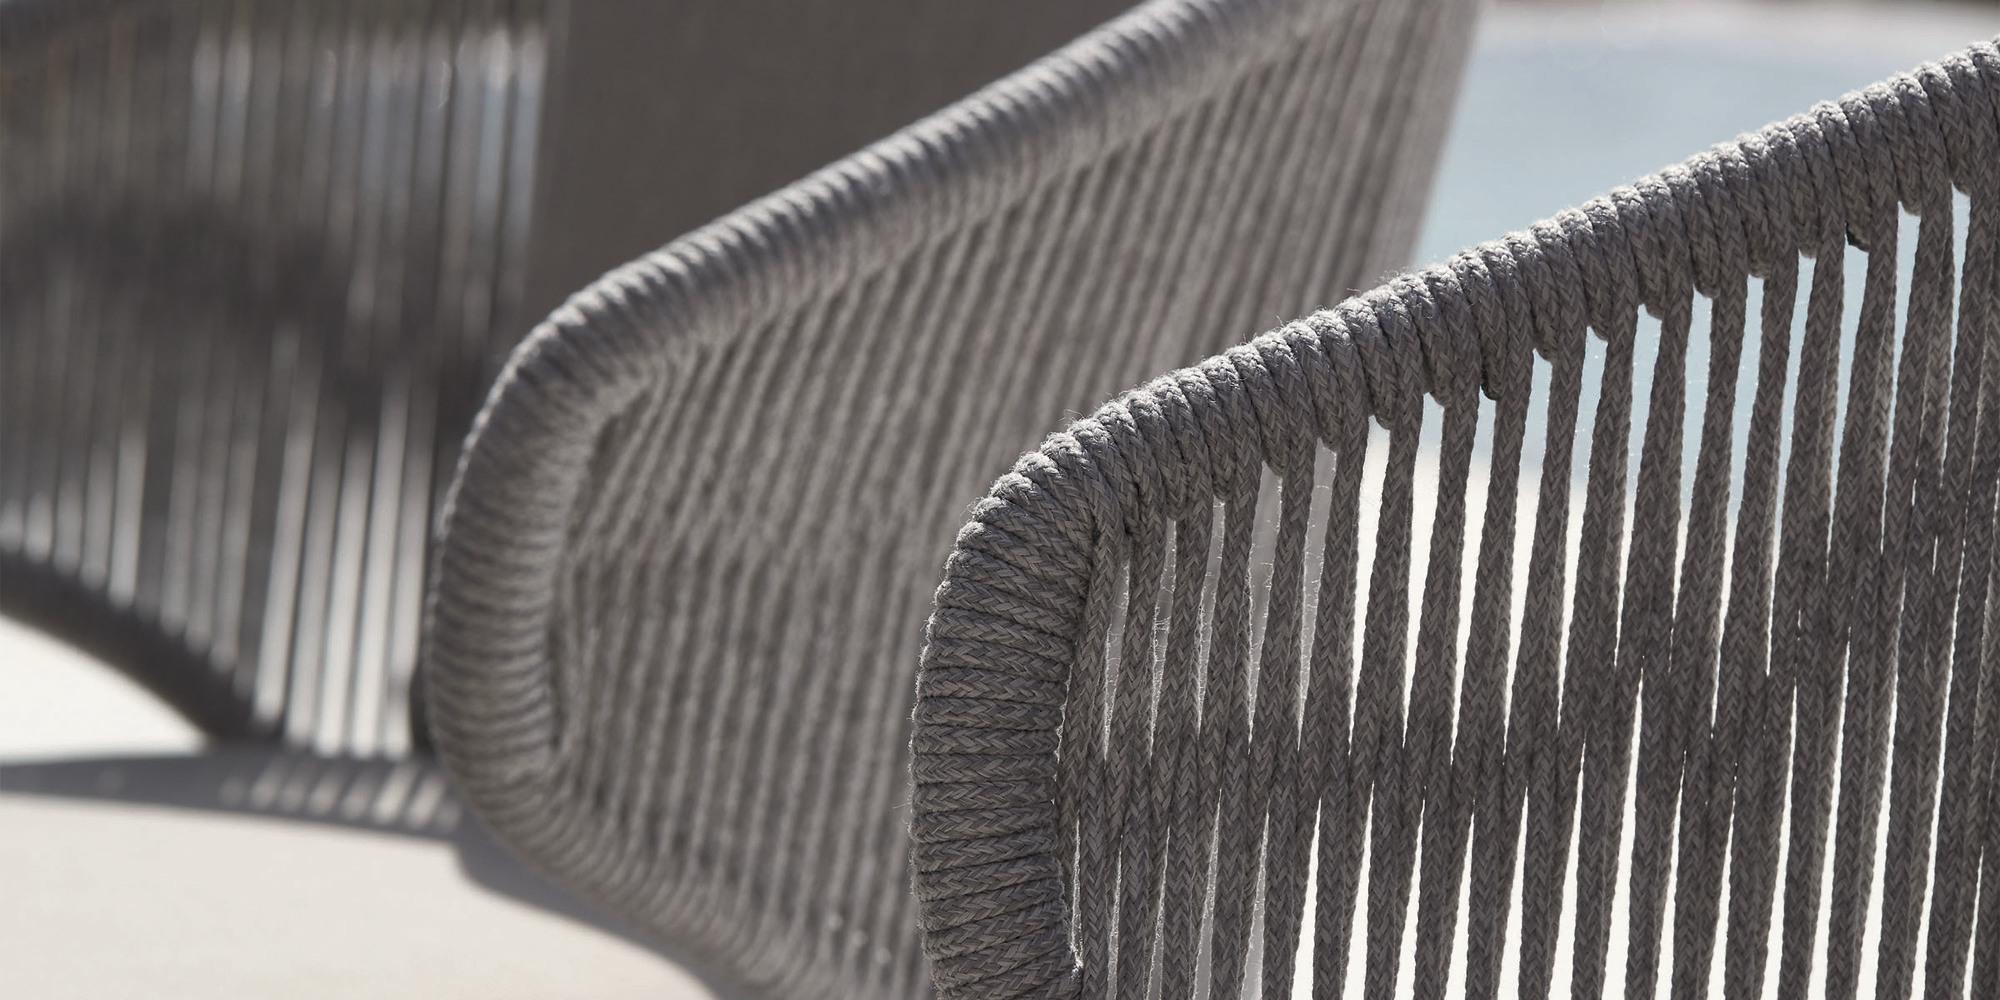 Radius chaise longue